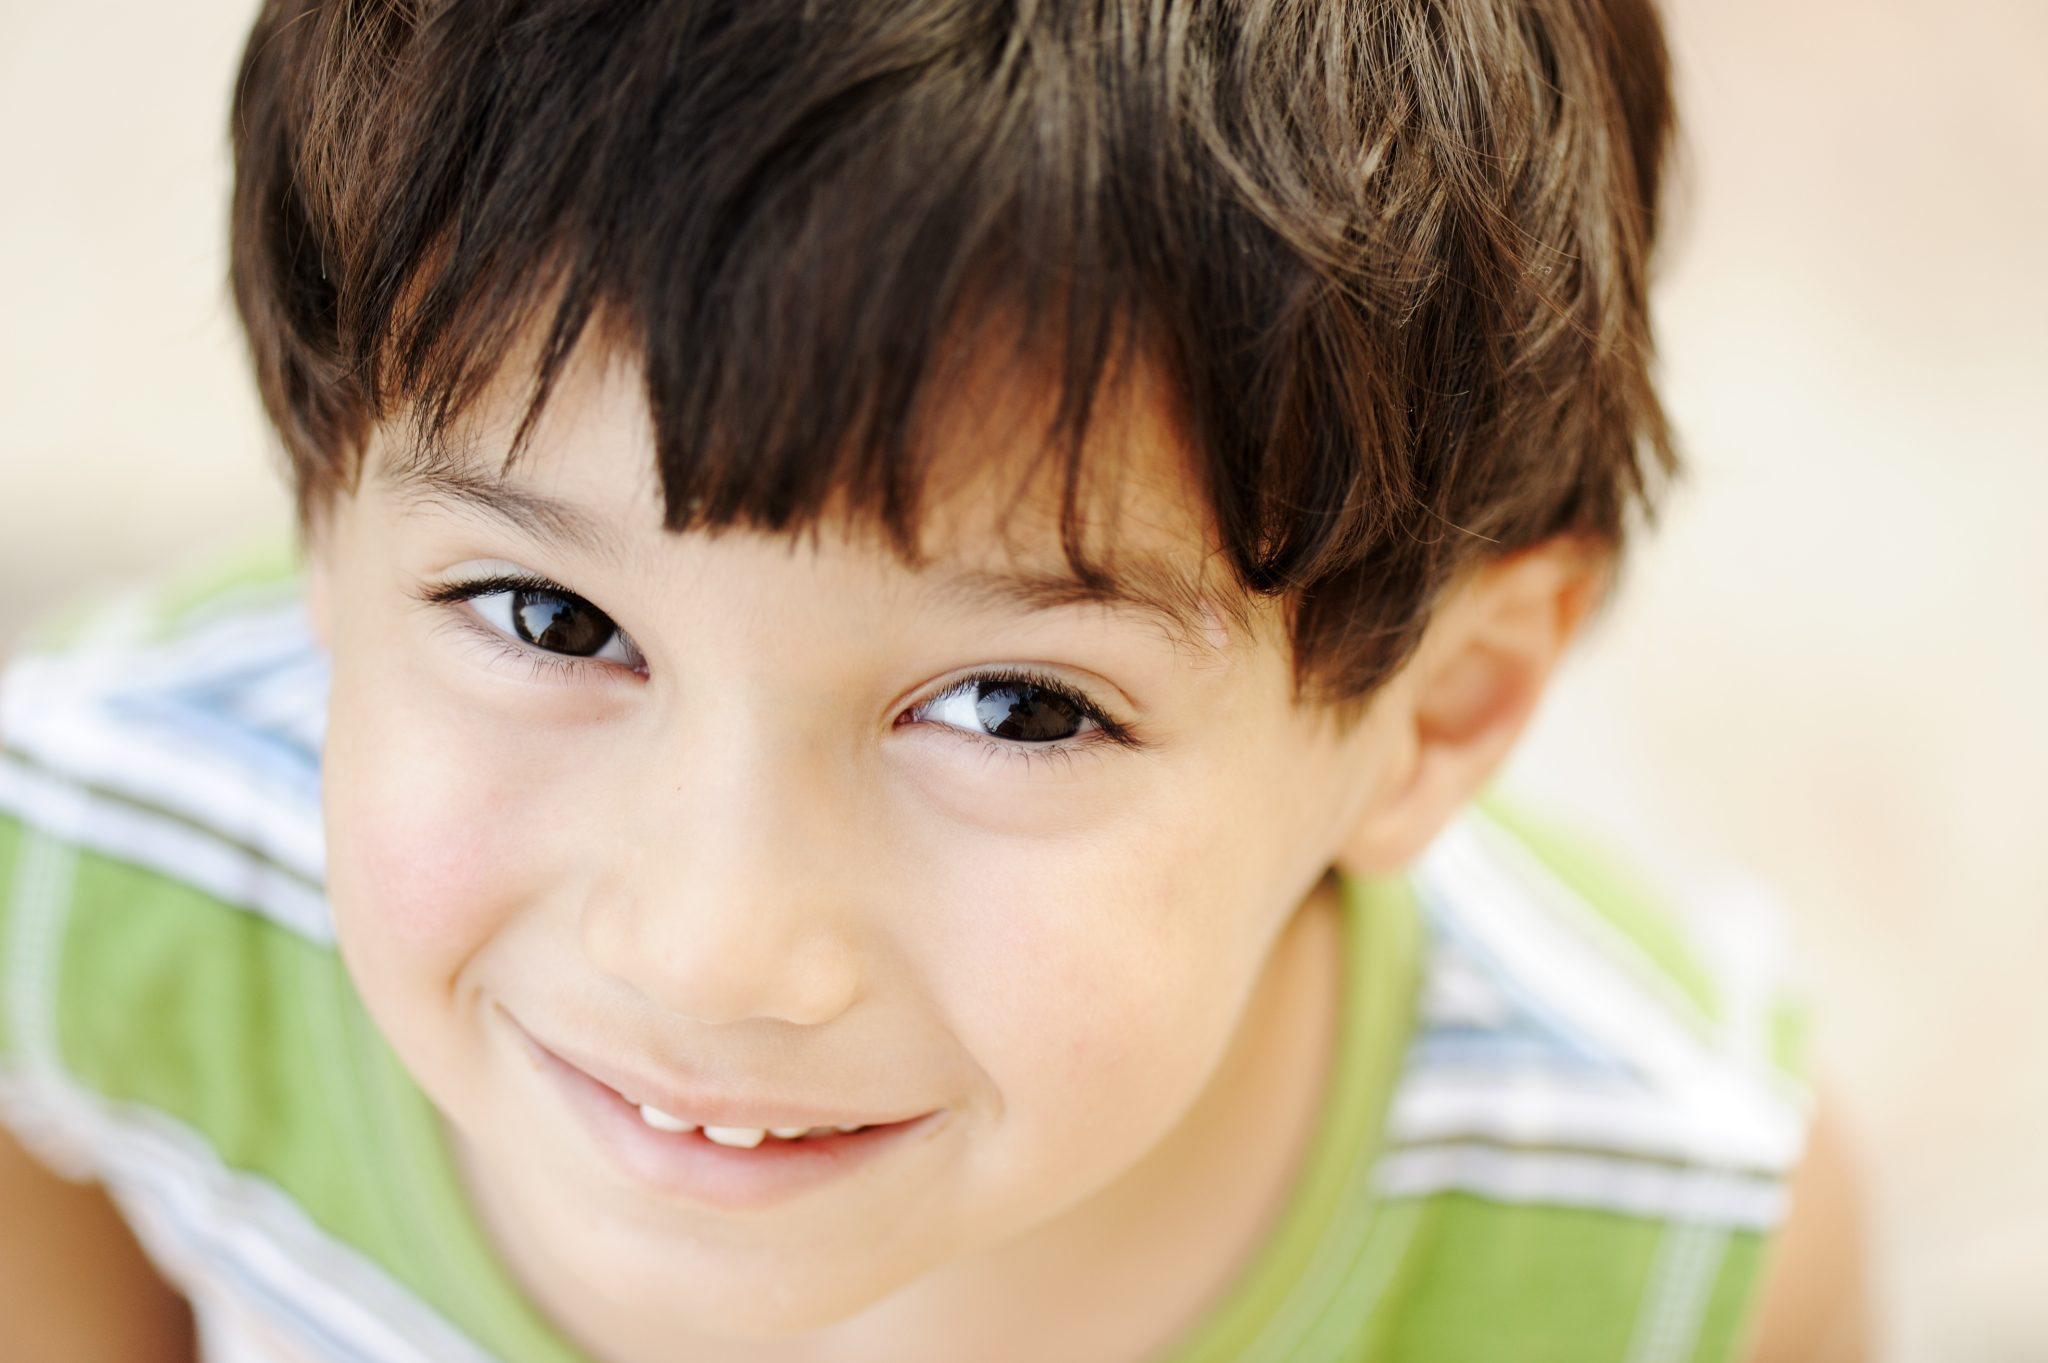 bigstock-Very-cute-happy-child-positiv-15440813